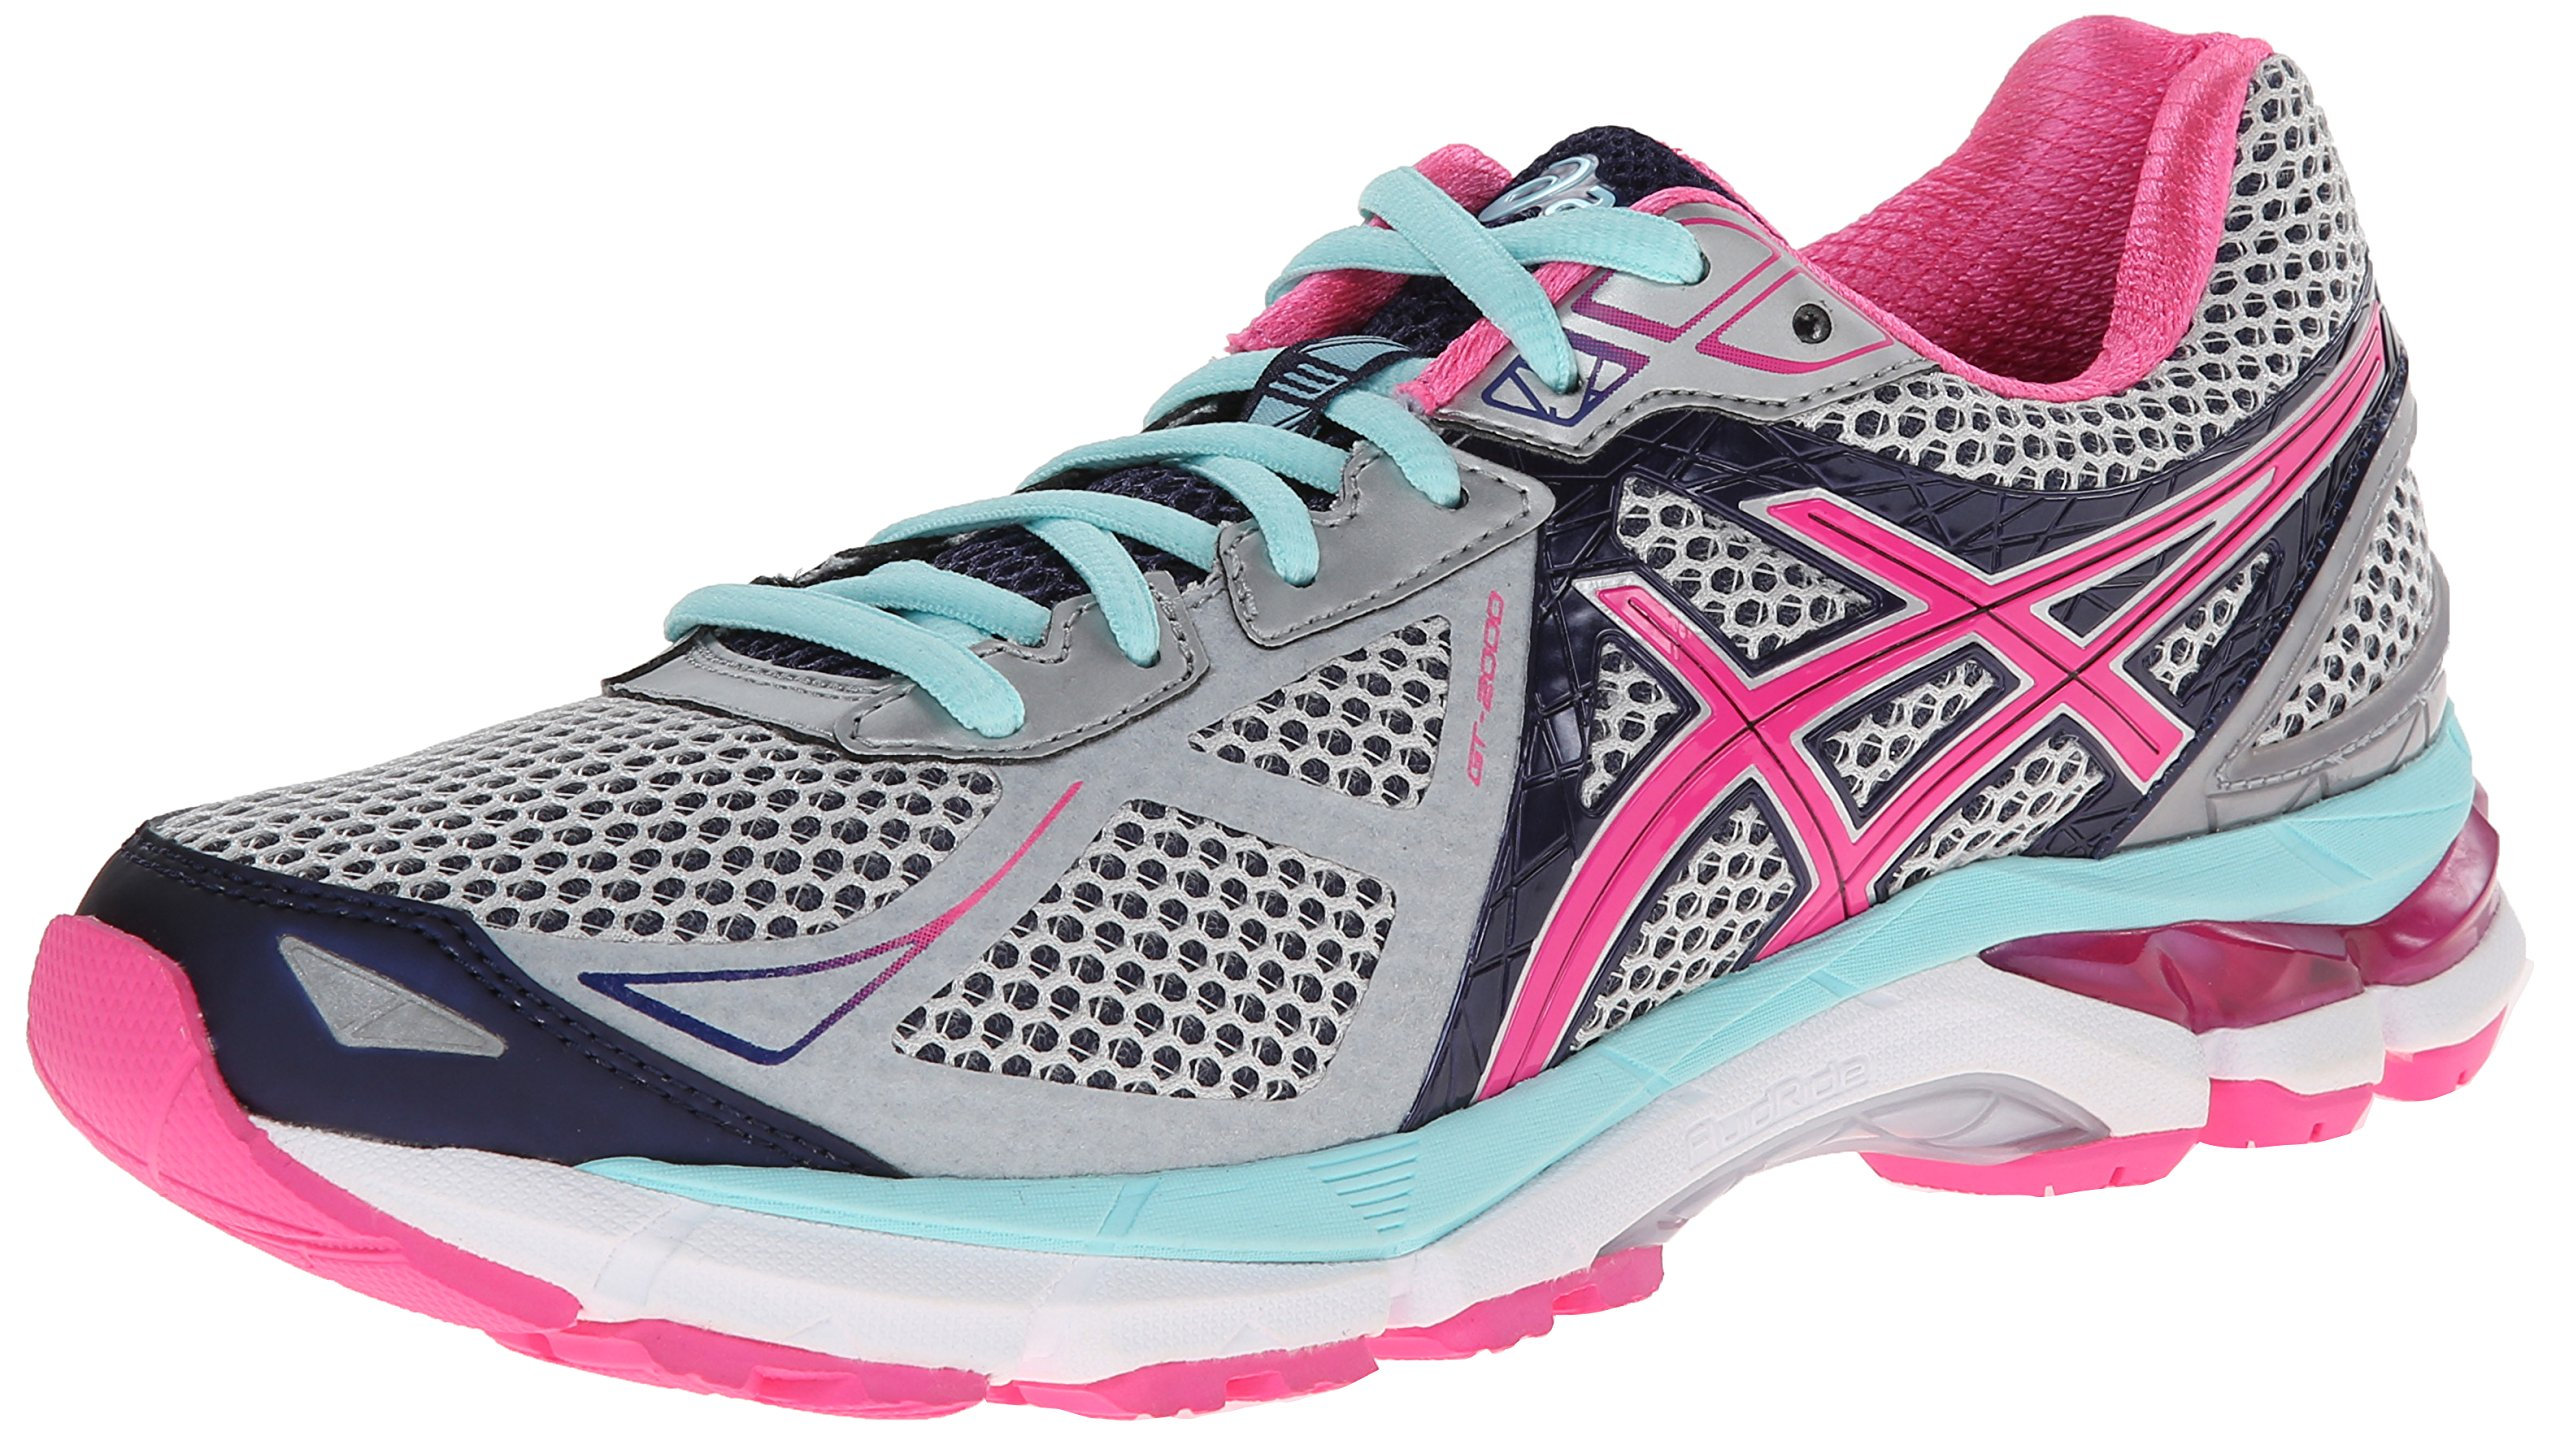 Women's Wide Tennis Shoes: Amazon.com